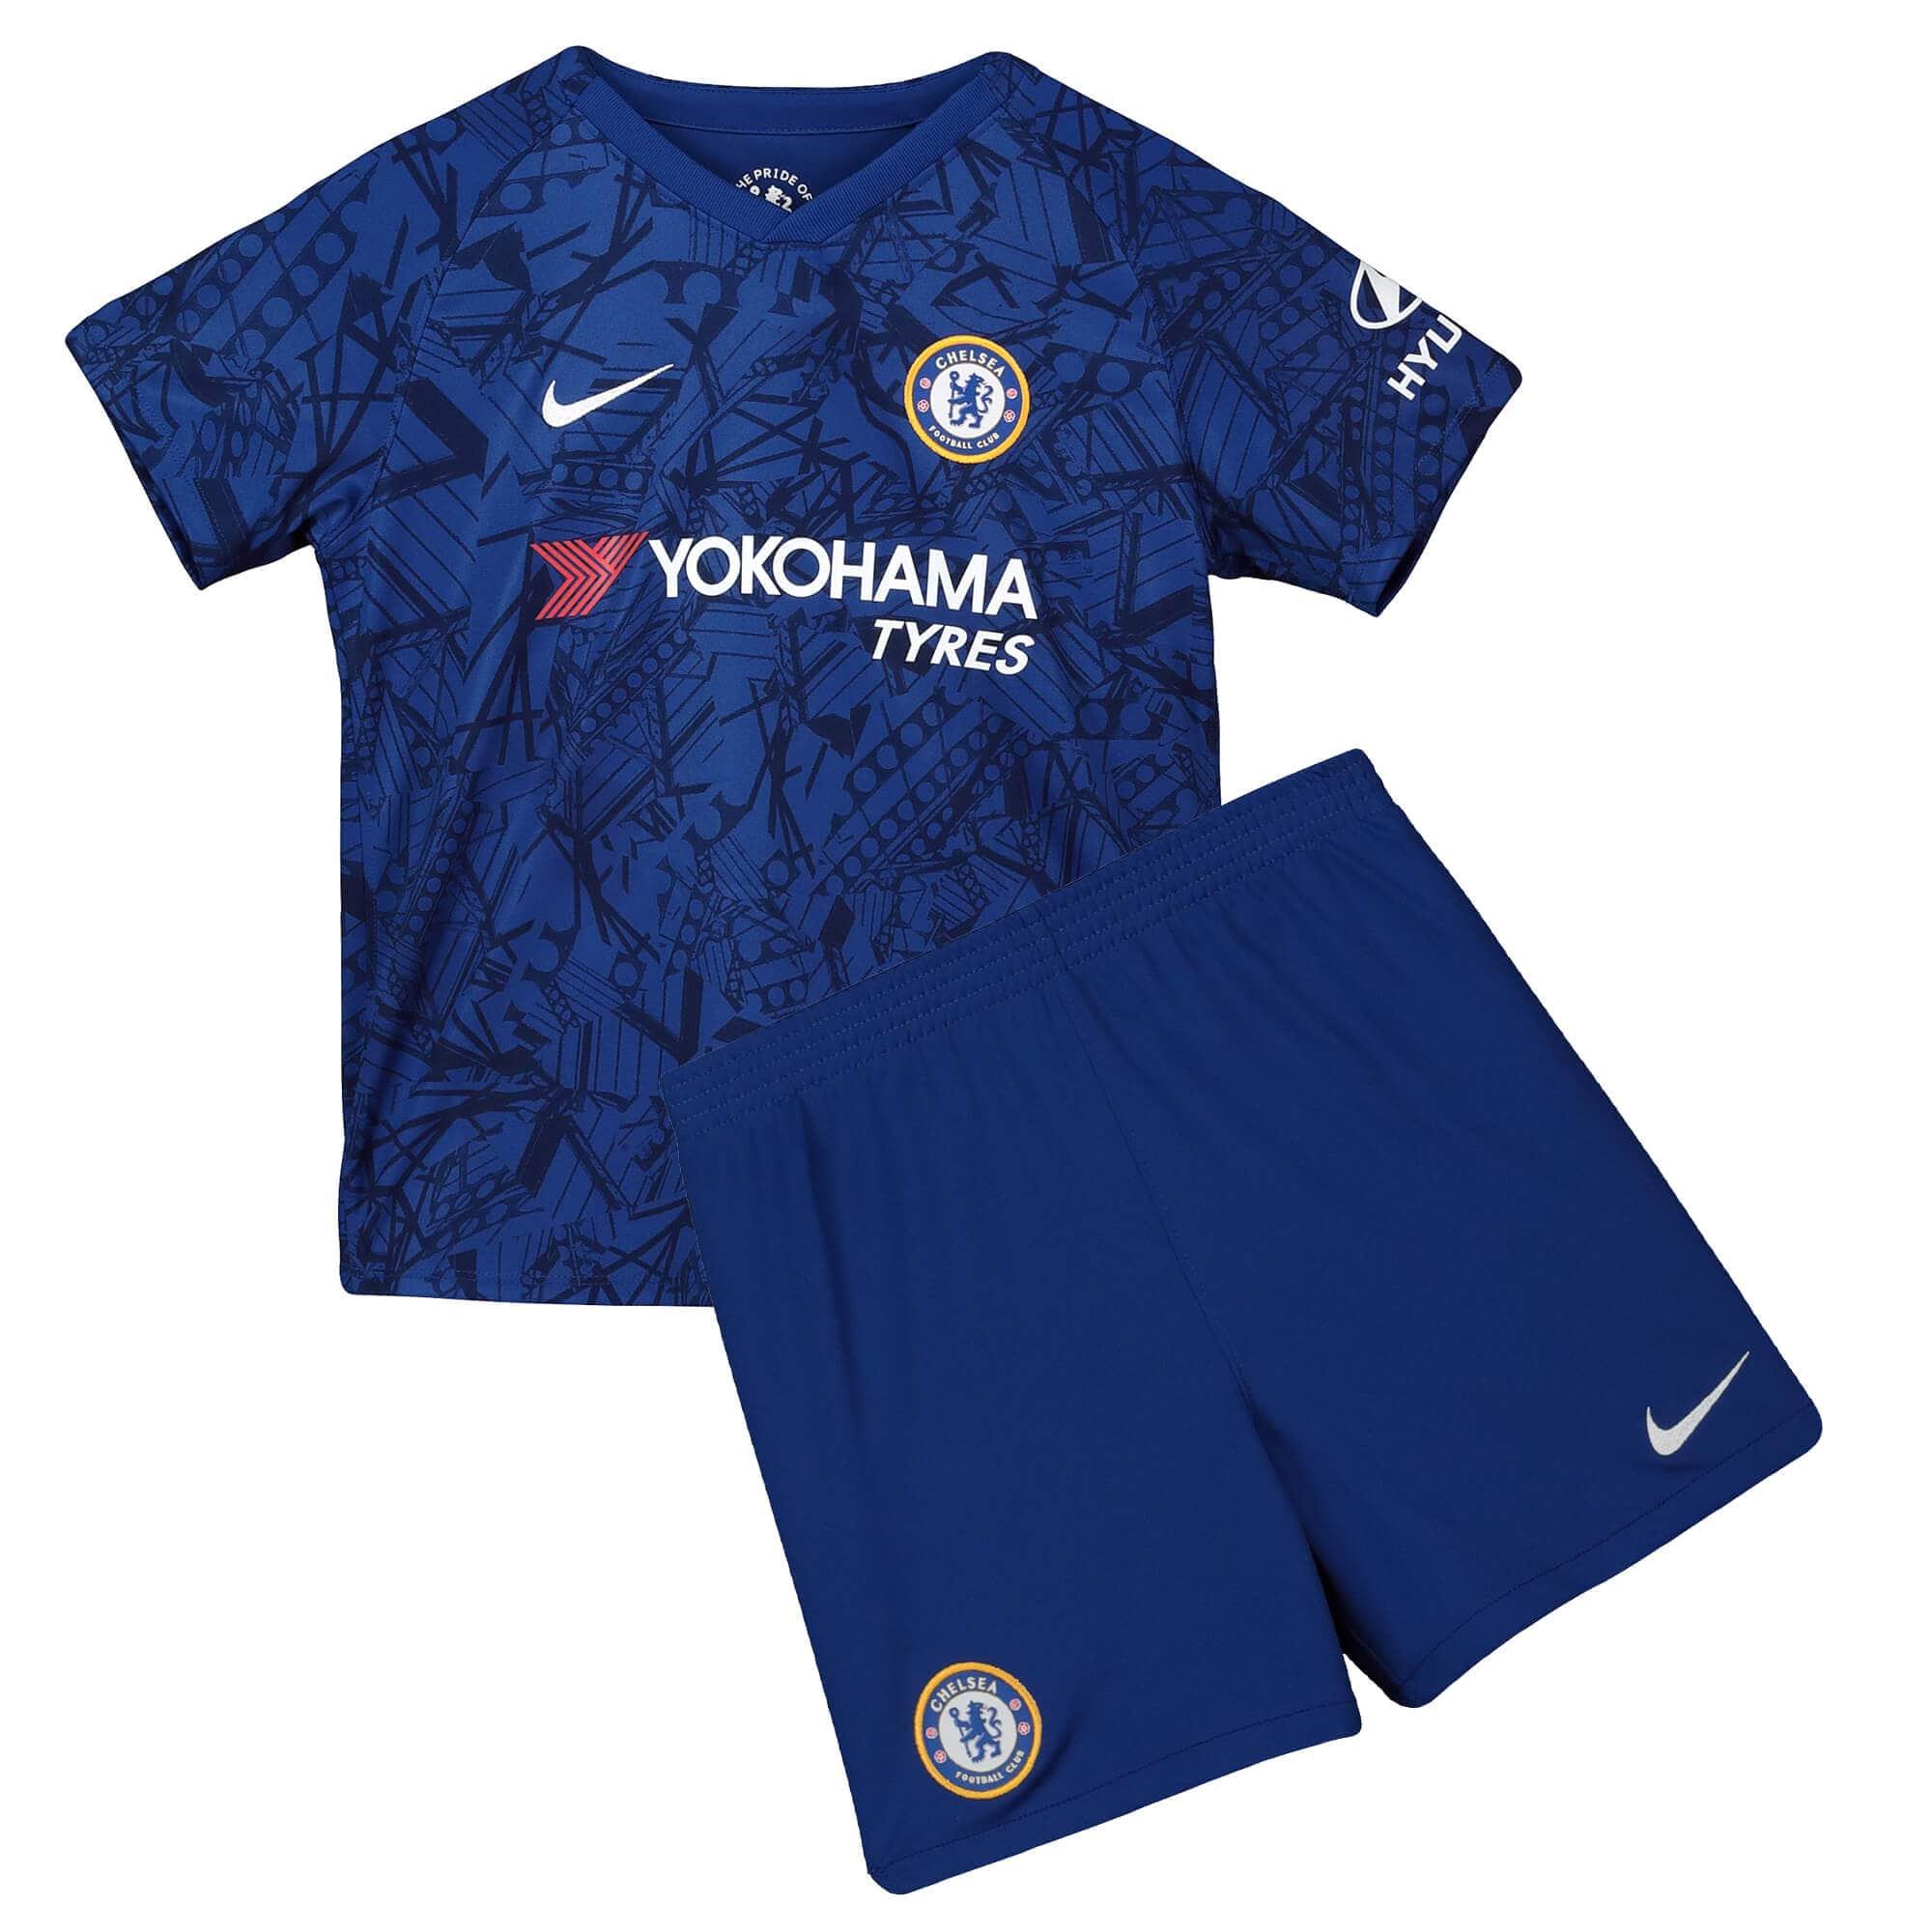 584883bf1 Chelsea kids home football jersey 19-20 front-min-2000x2000.jpg